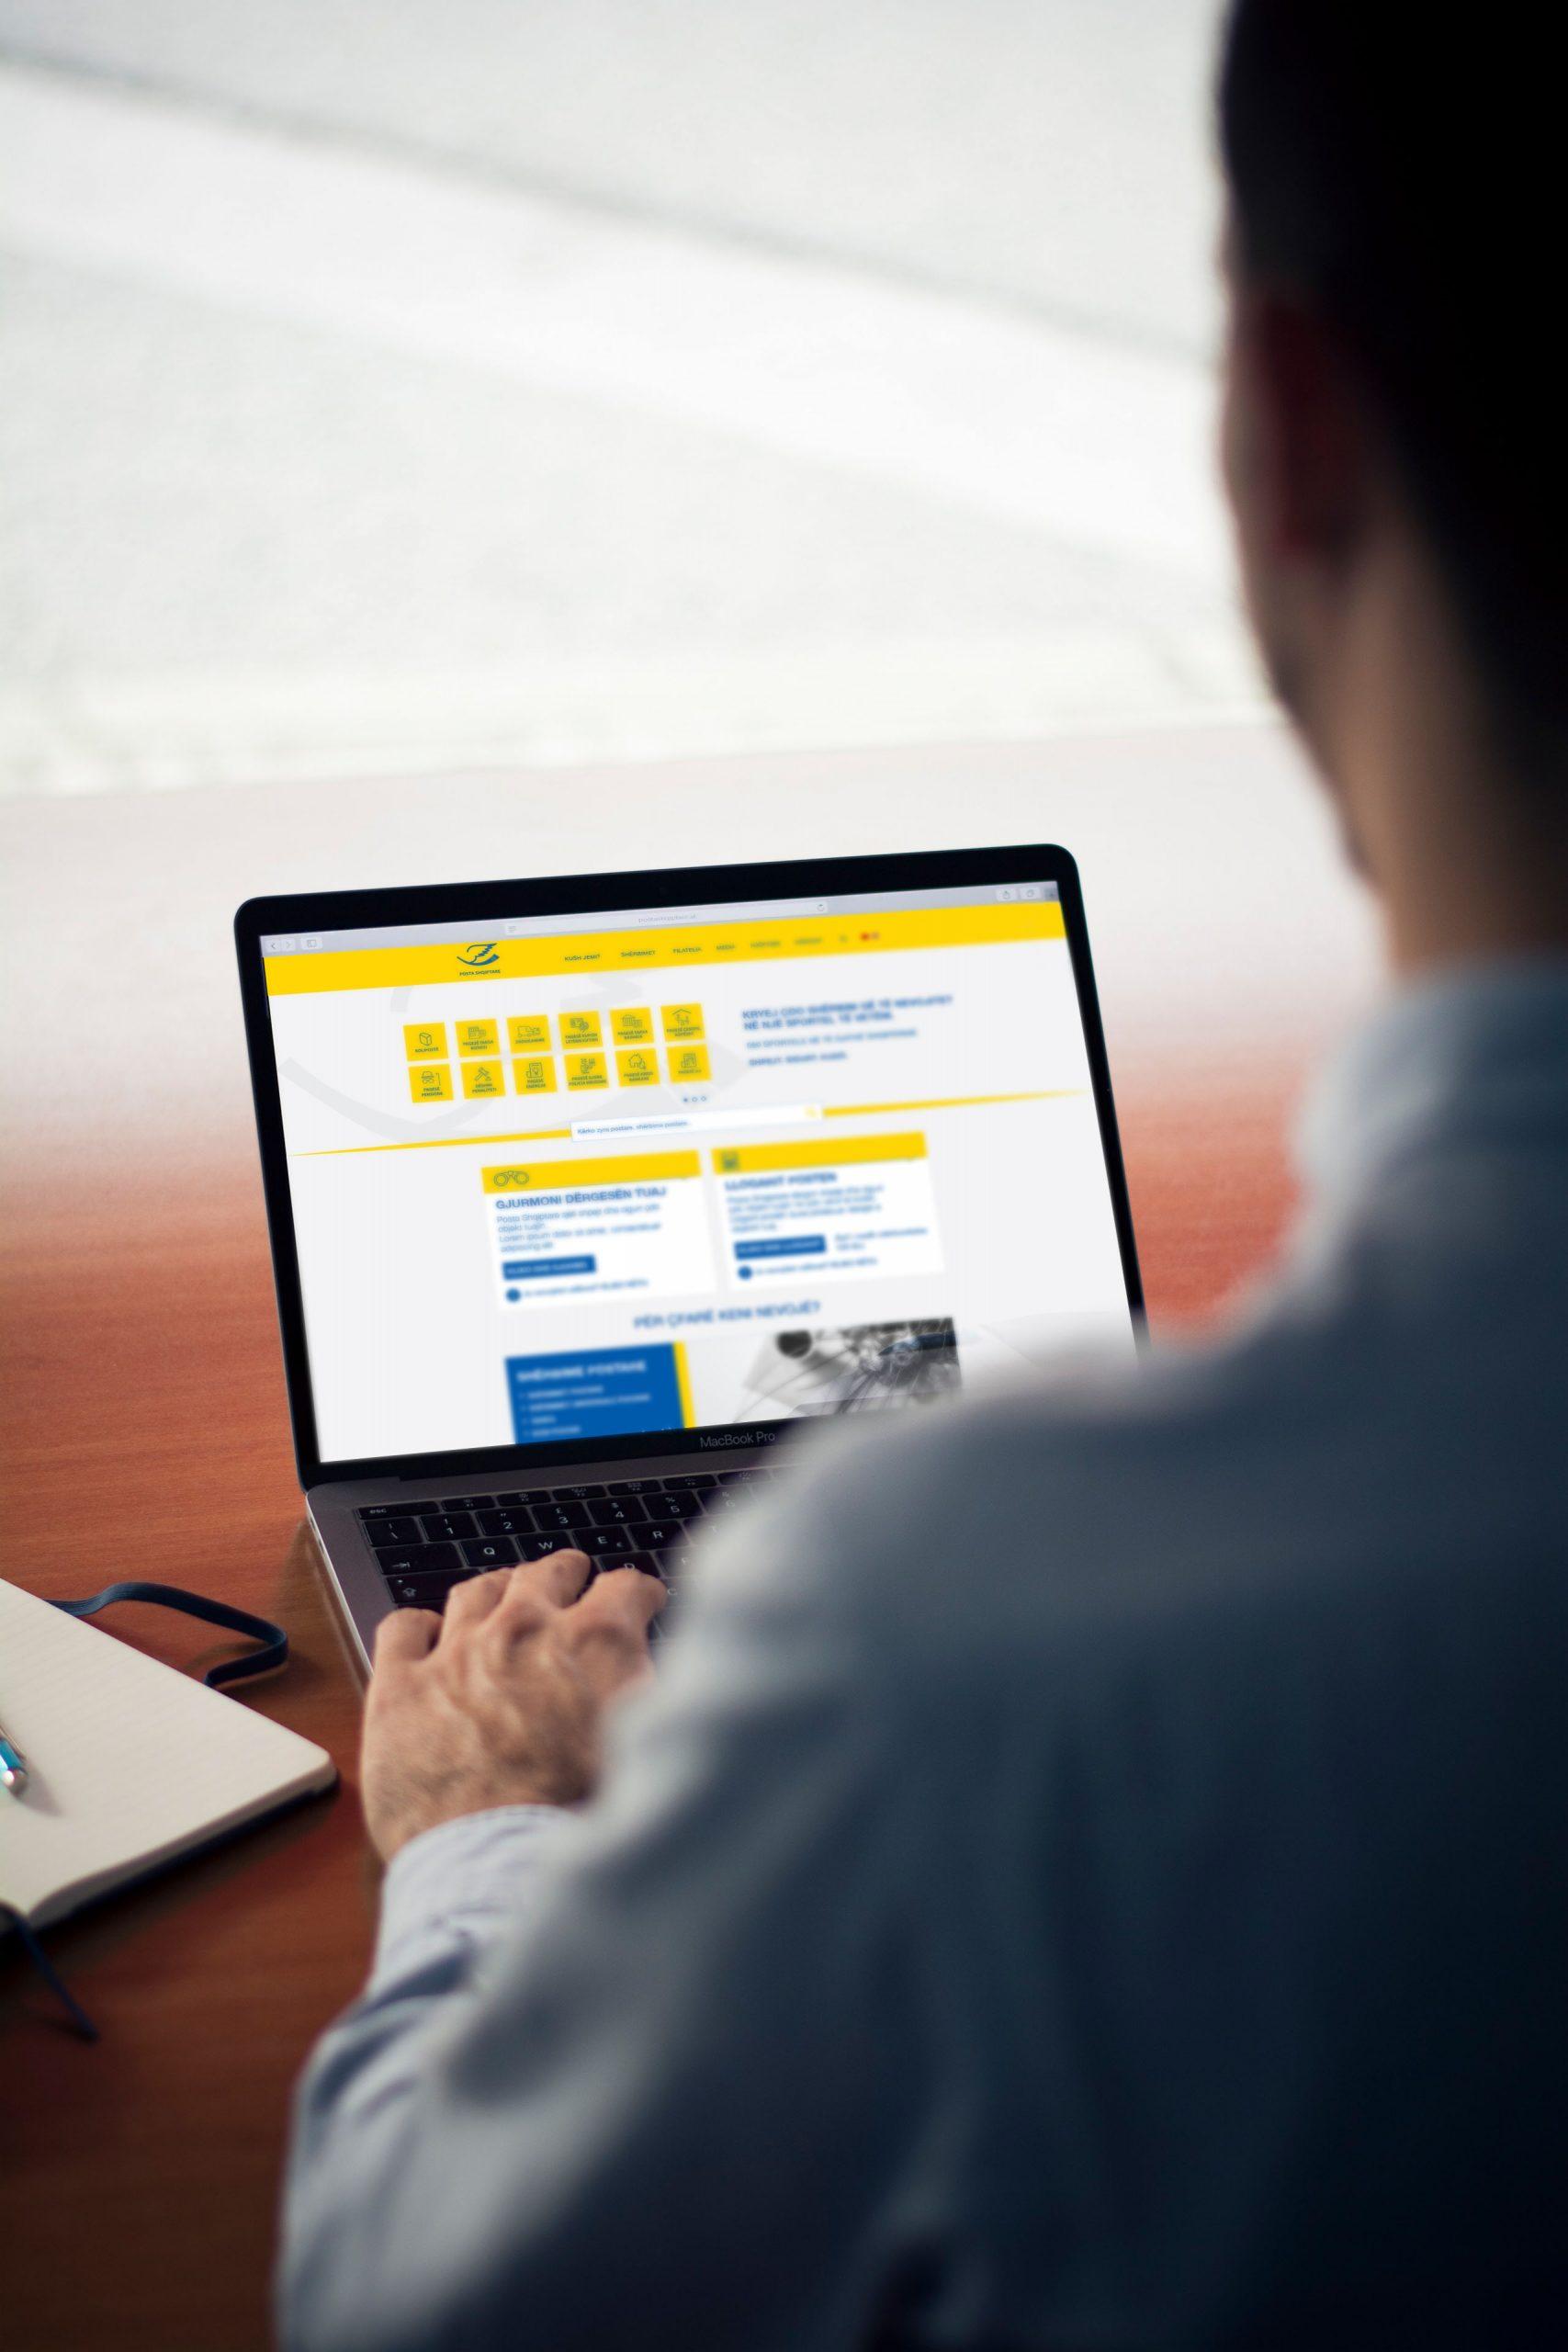 Posta Shqiptare Project Img 6 - Vatra Agency / Founder & CEO Gerton Bejo